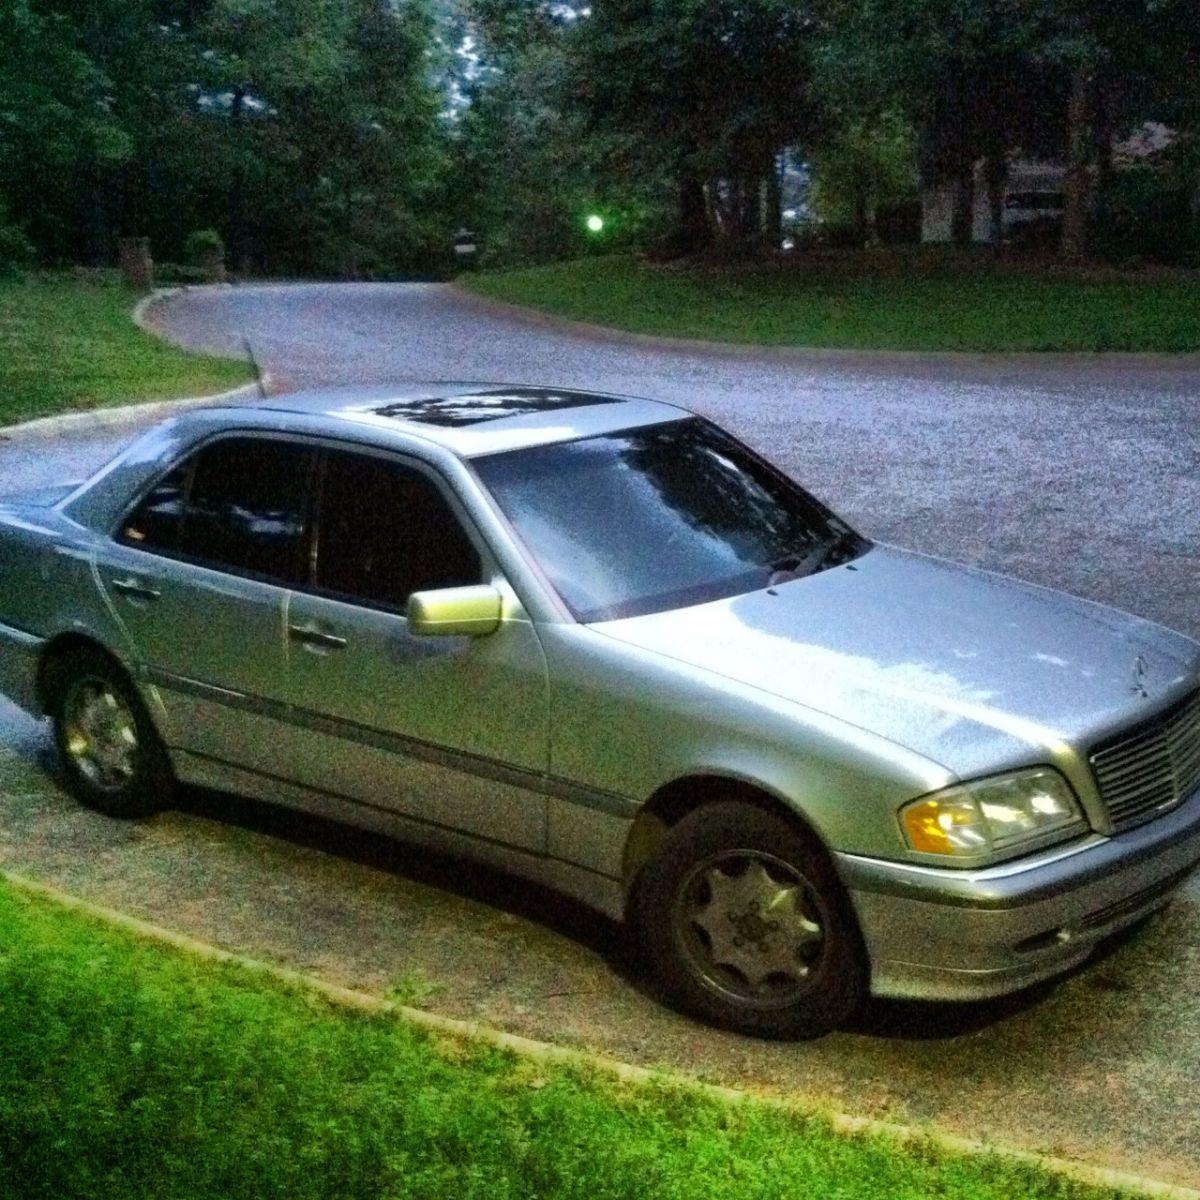 1999 mercedes c230 for sale greenville south carolina for Mercedes benz c230 1999